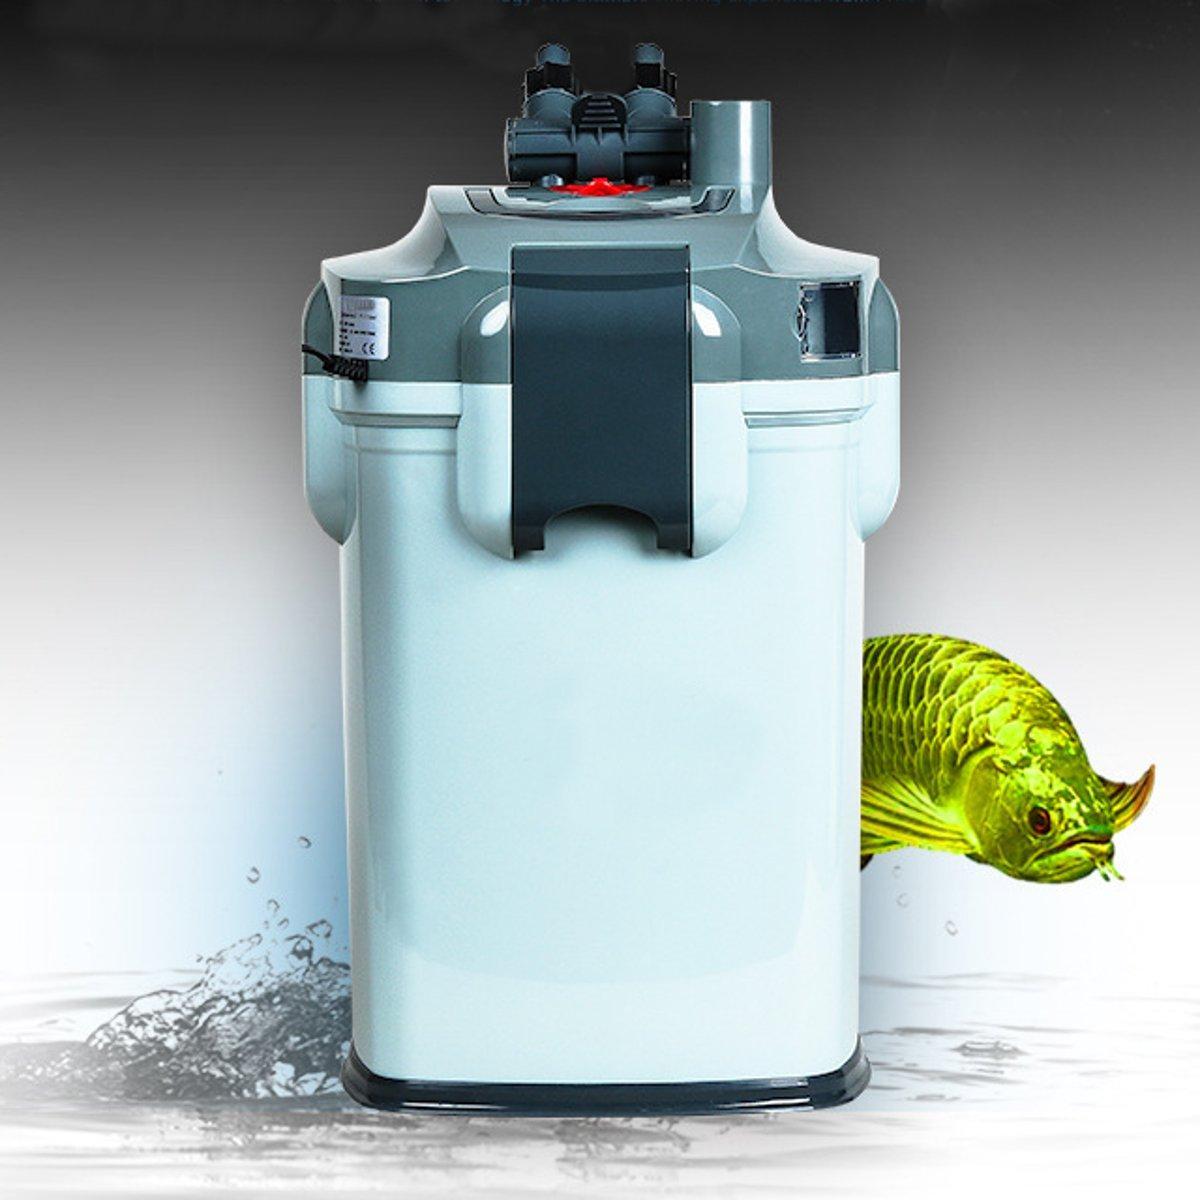 Biopro Aquarium External Canister Fish Tank Water Filter 1800 LPH + Aqua Sponge